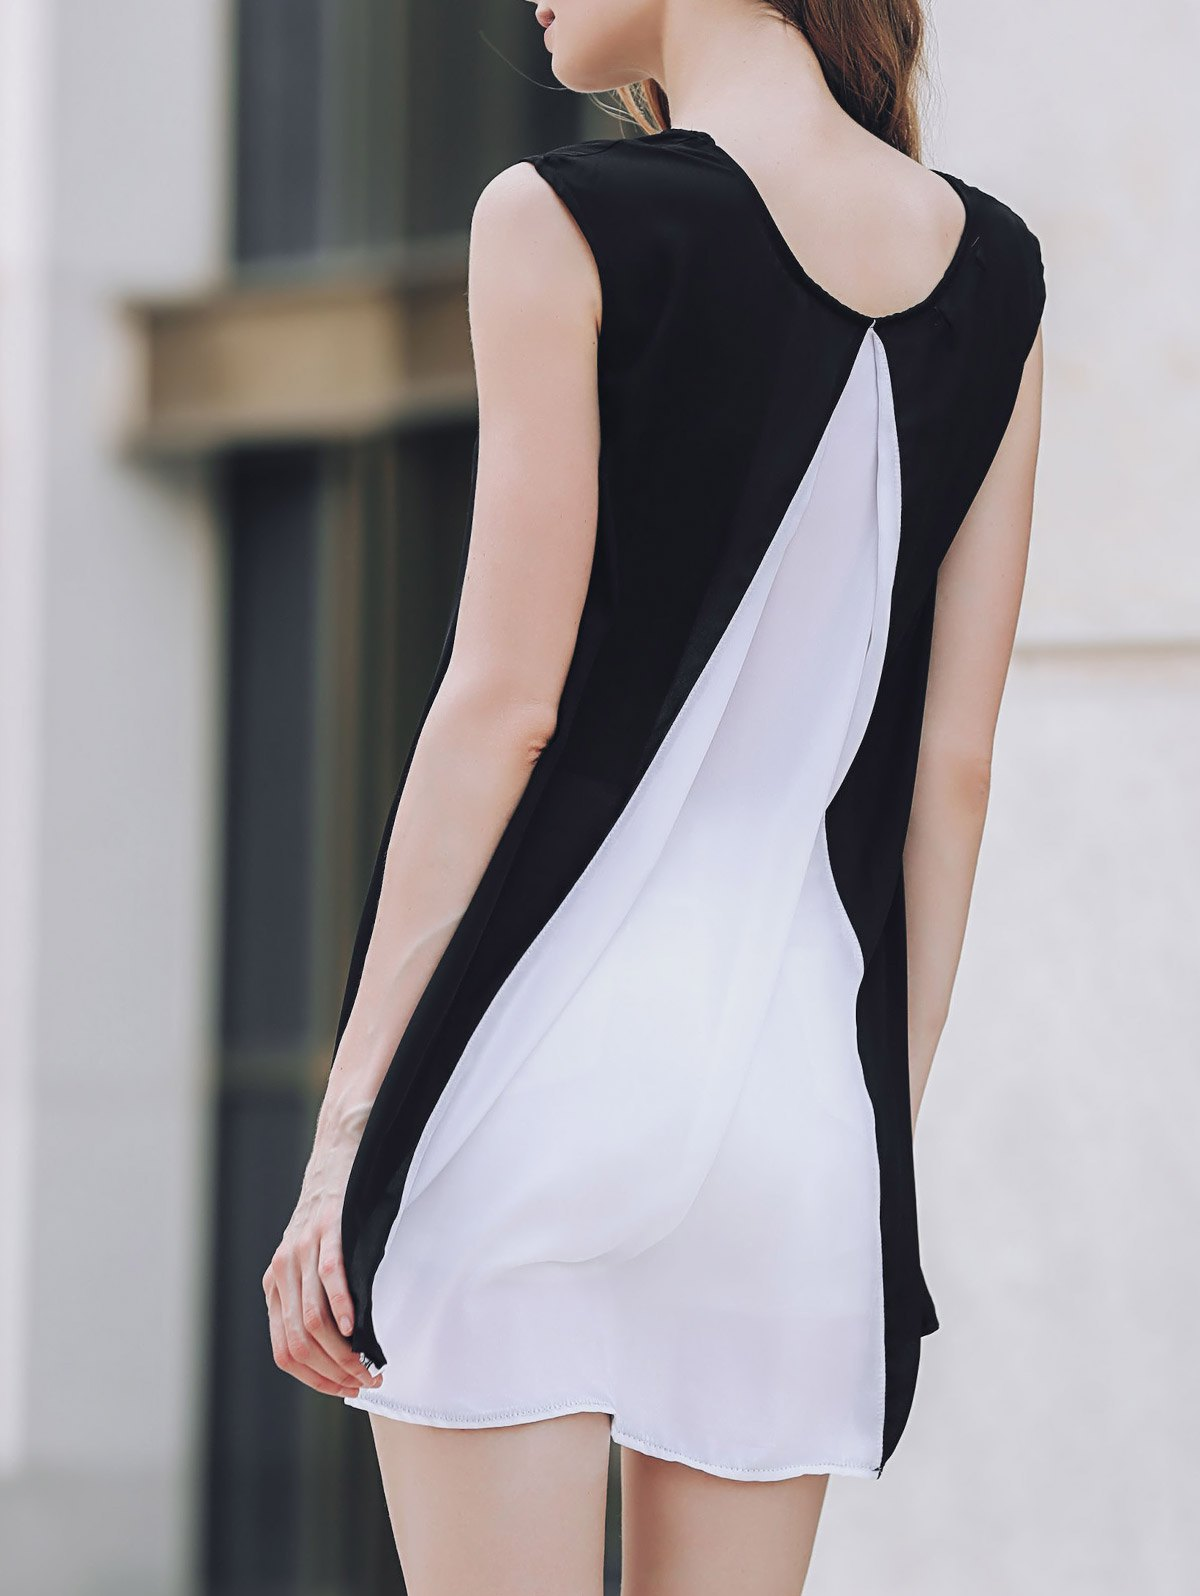 Cap Sleeve Hit Color Chiffon DressClothes<br><br><br>Size: L<br>Color: WHITE AND BLACK